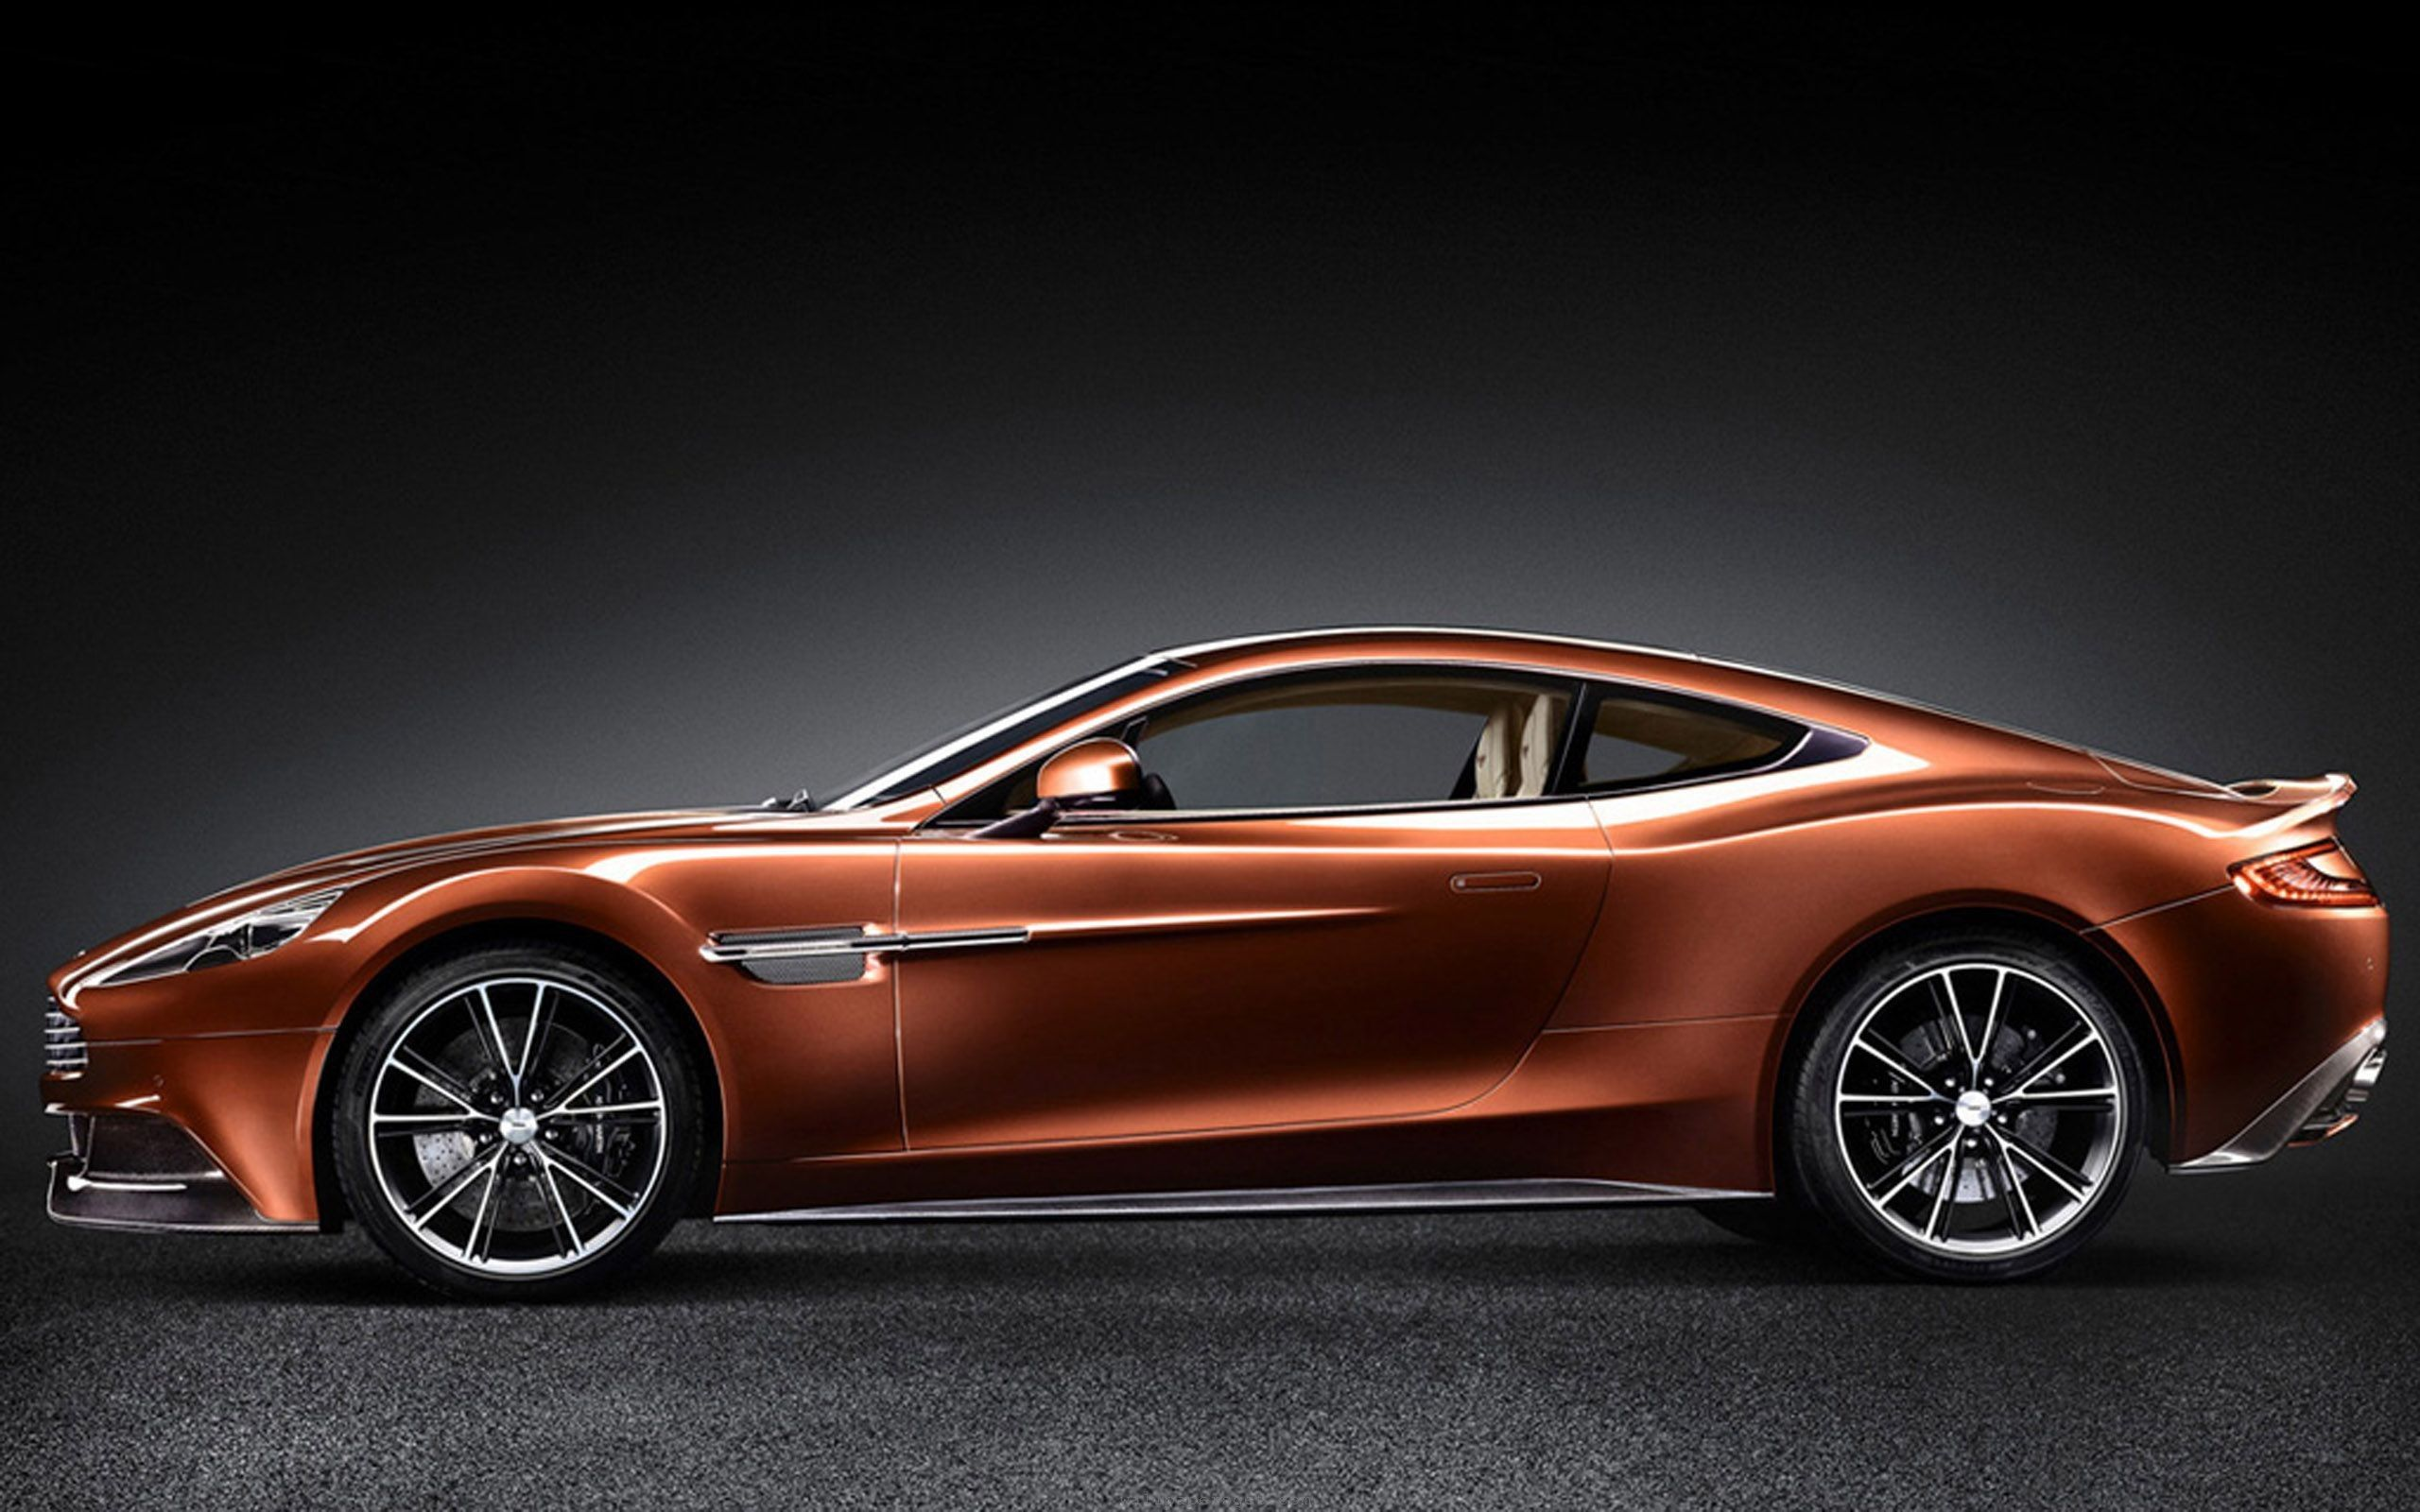 Aston Martin V12 Vanquish British Luxury Elegant Sports Cars Side Wheels Wallpapers